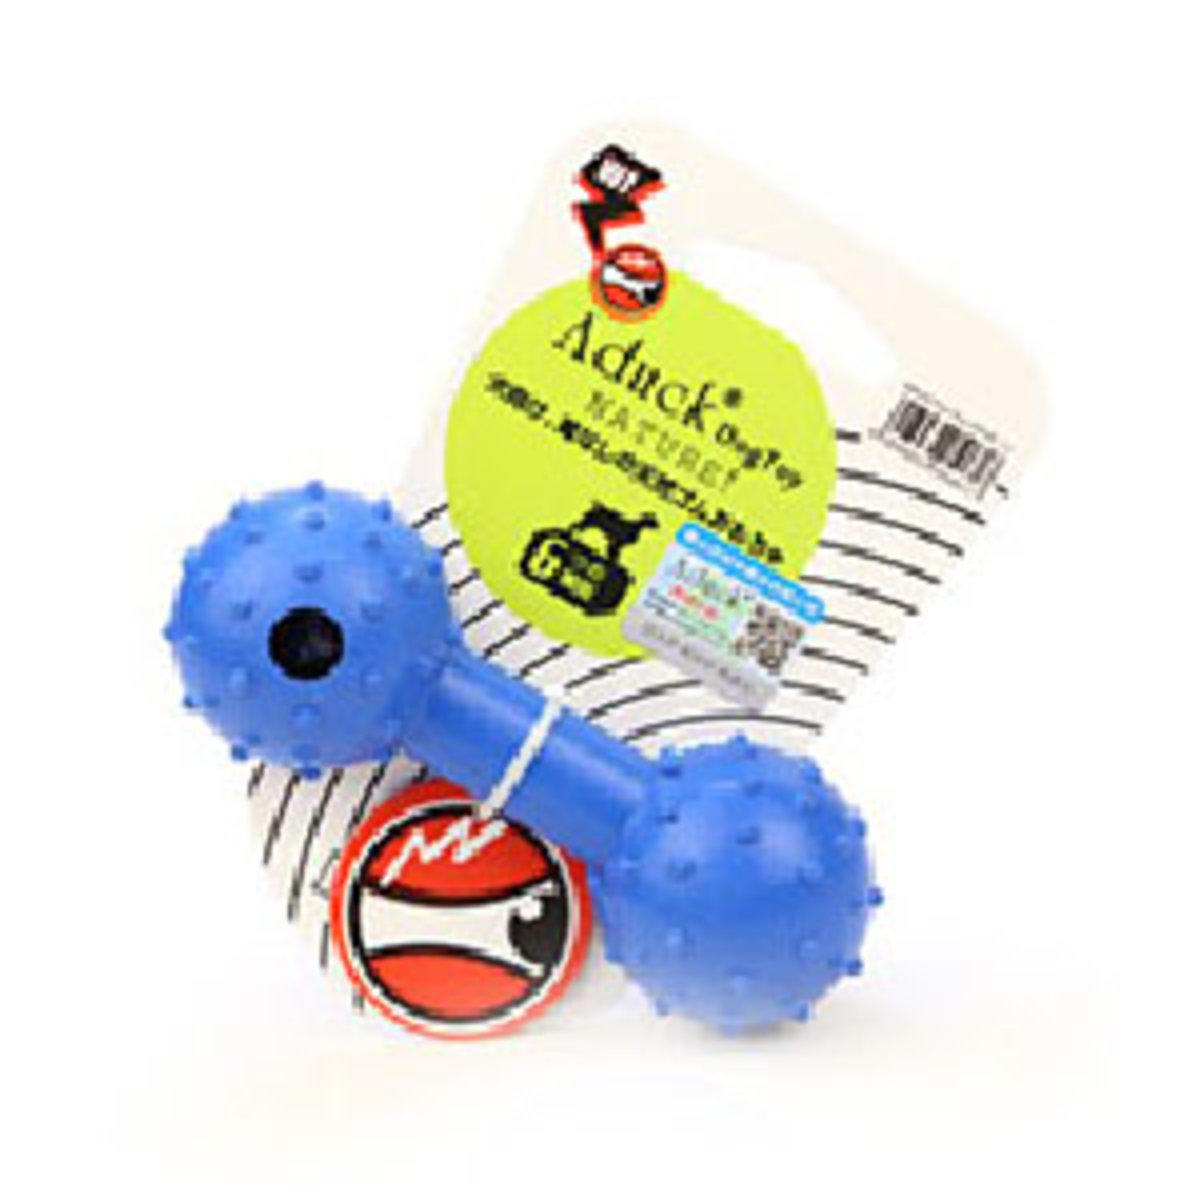 Aduck 橡膠啞鈴帶鈴鐺耐咬潔齒狗狗玩具 (藍)